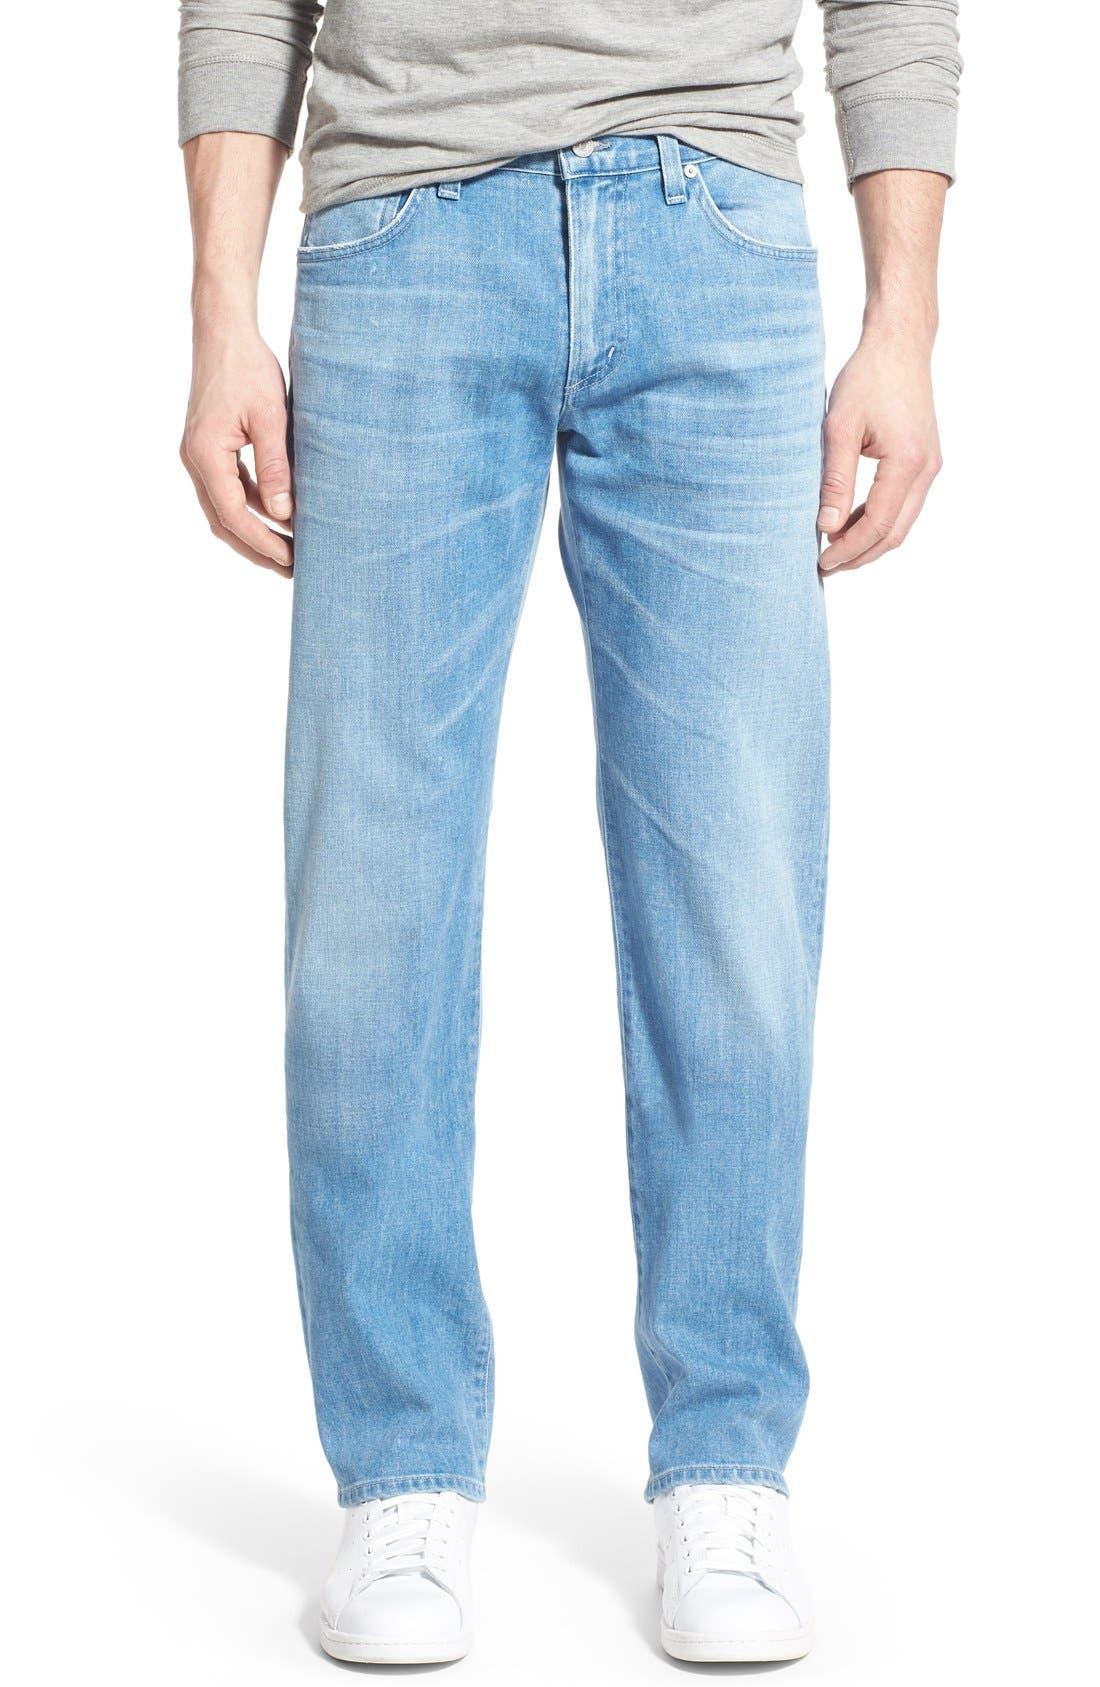 'Sid' Straight Leg Jeans,                             Main thumbnail 1, color,                             Rogue